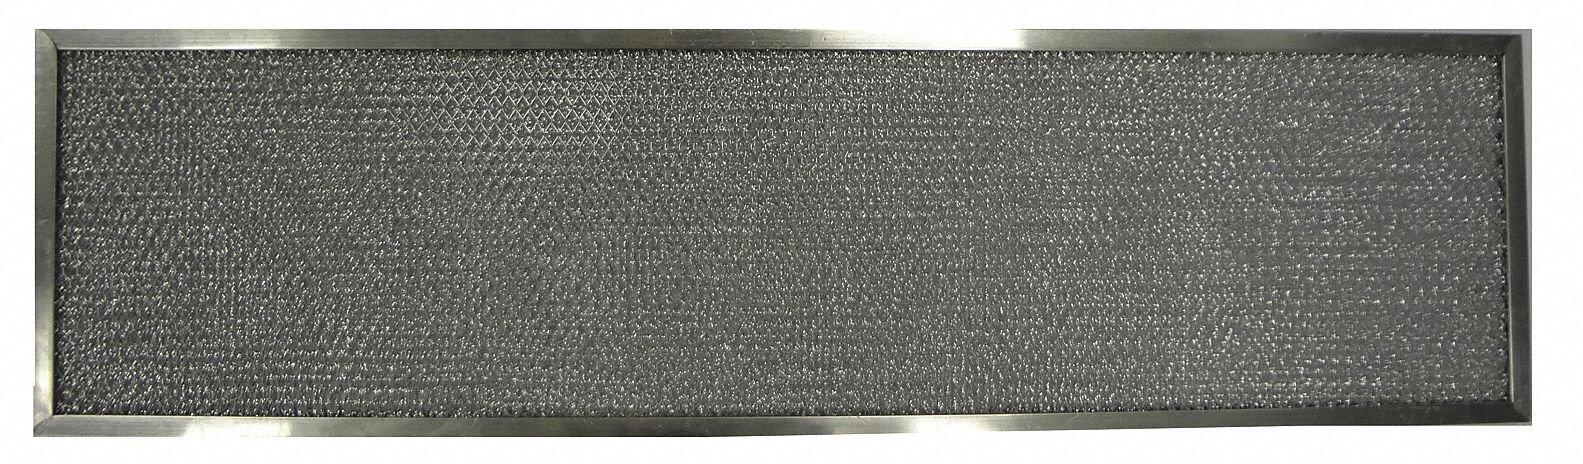 Alum Mesh Filter, 10-1/8Hx35-3/4W, PK2